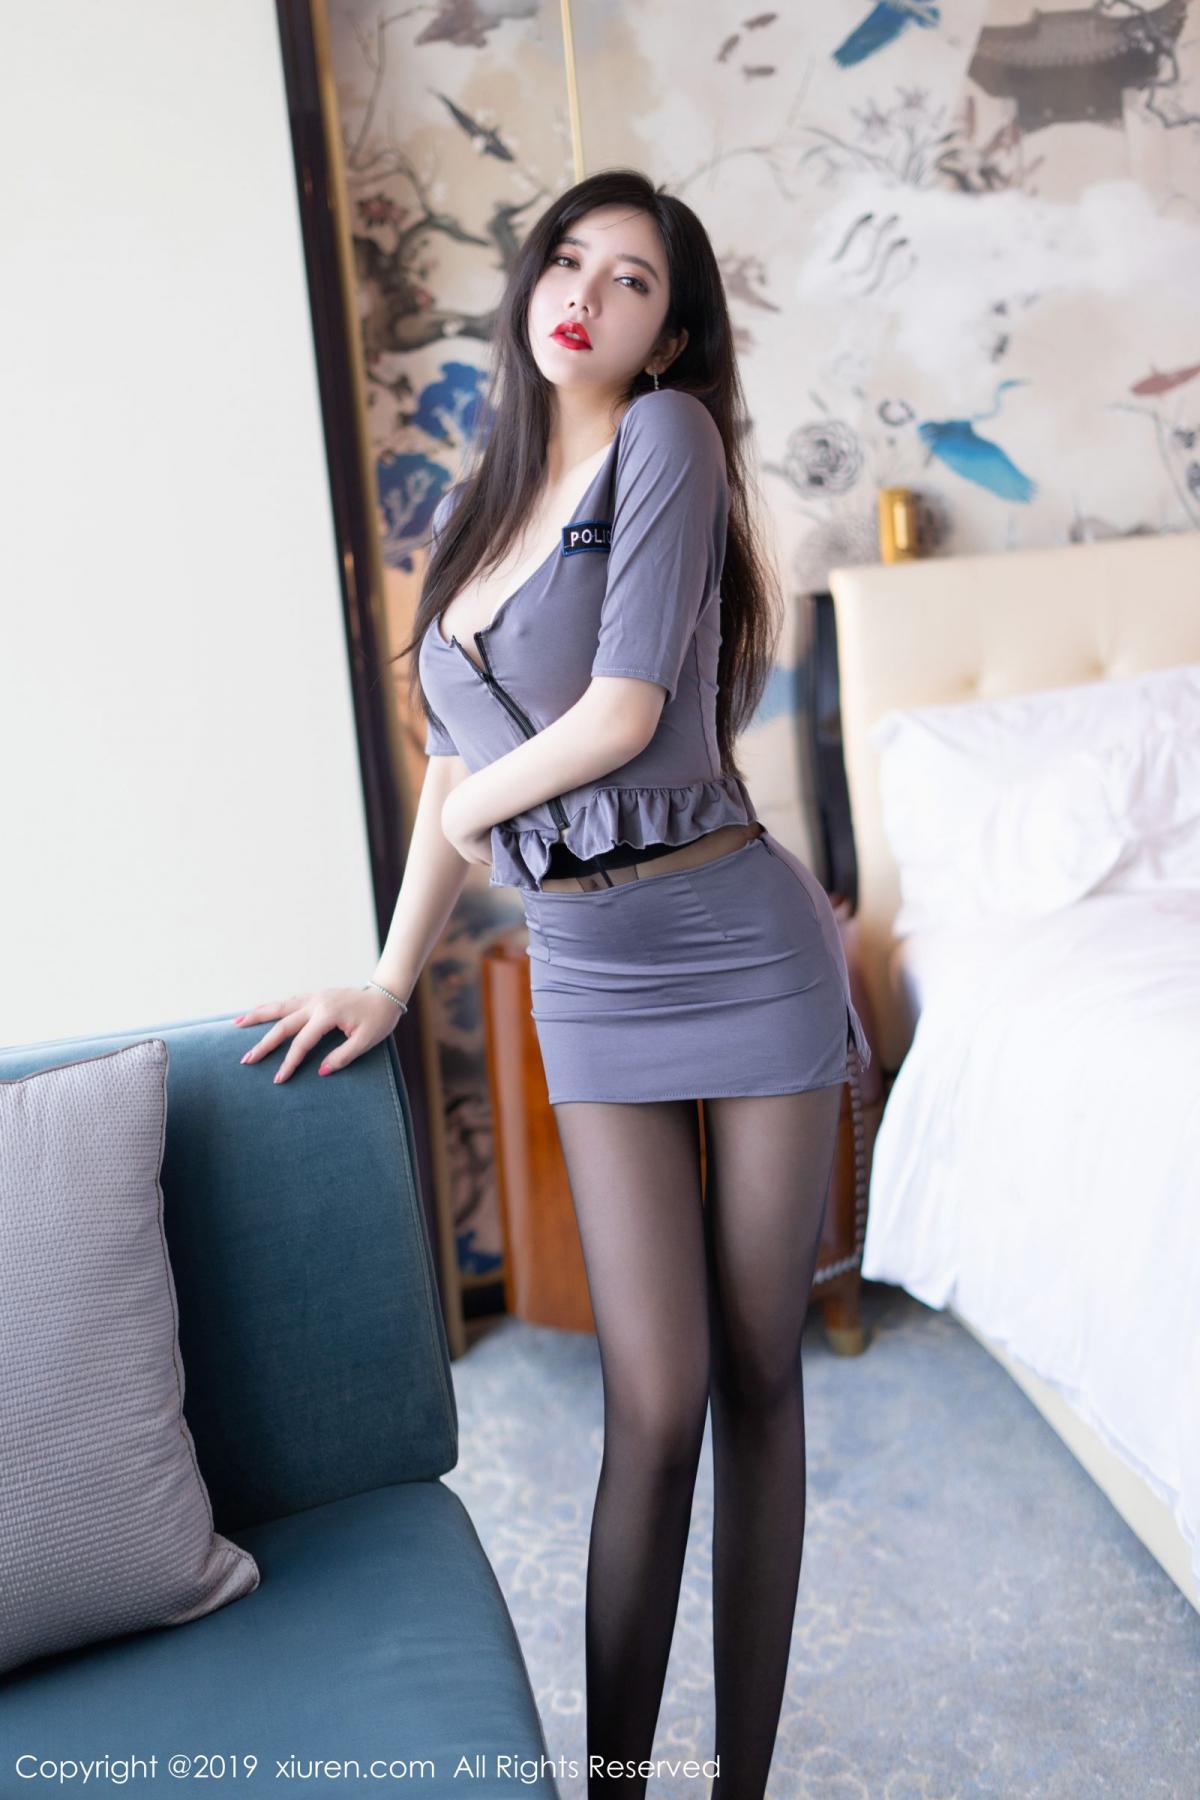 [XiuRen] Vol.1636 Li Yan Xi 6P, Li Yan Xi, Policewoman, Xiuren